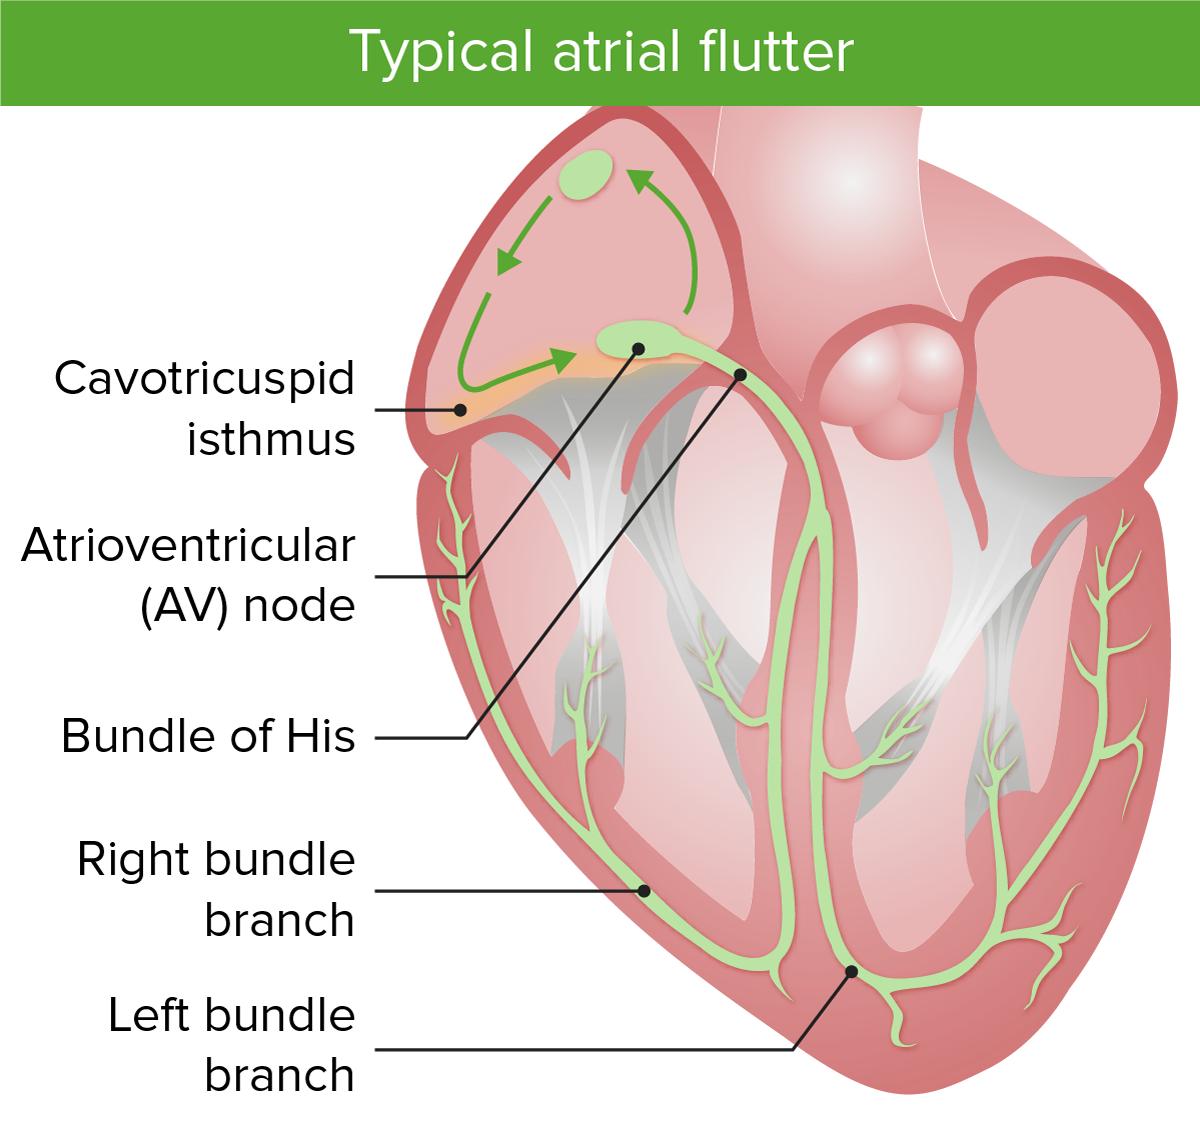 Typical atrial flutter